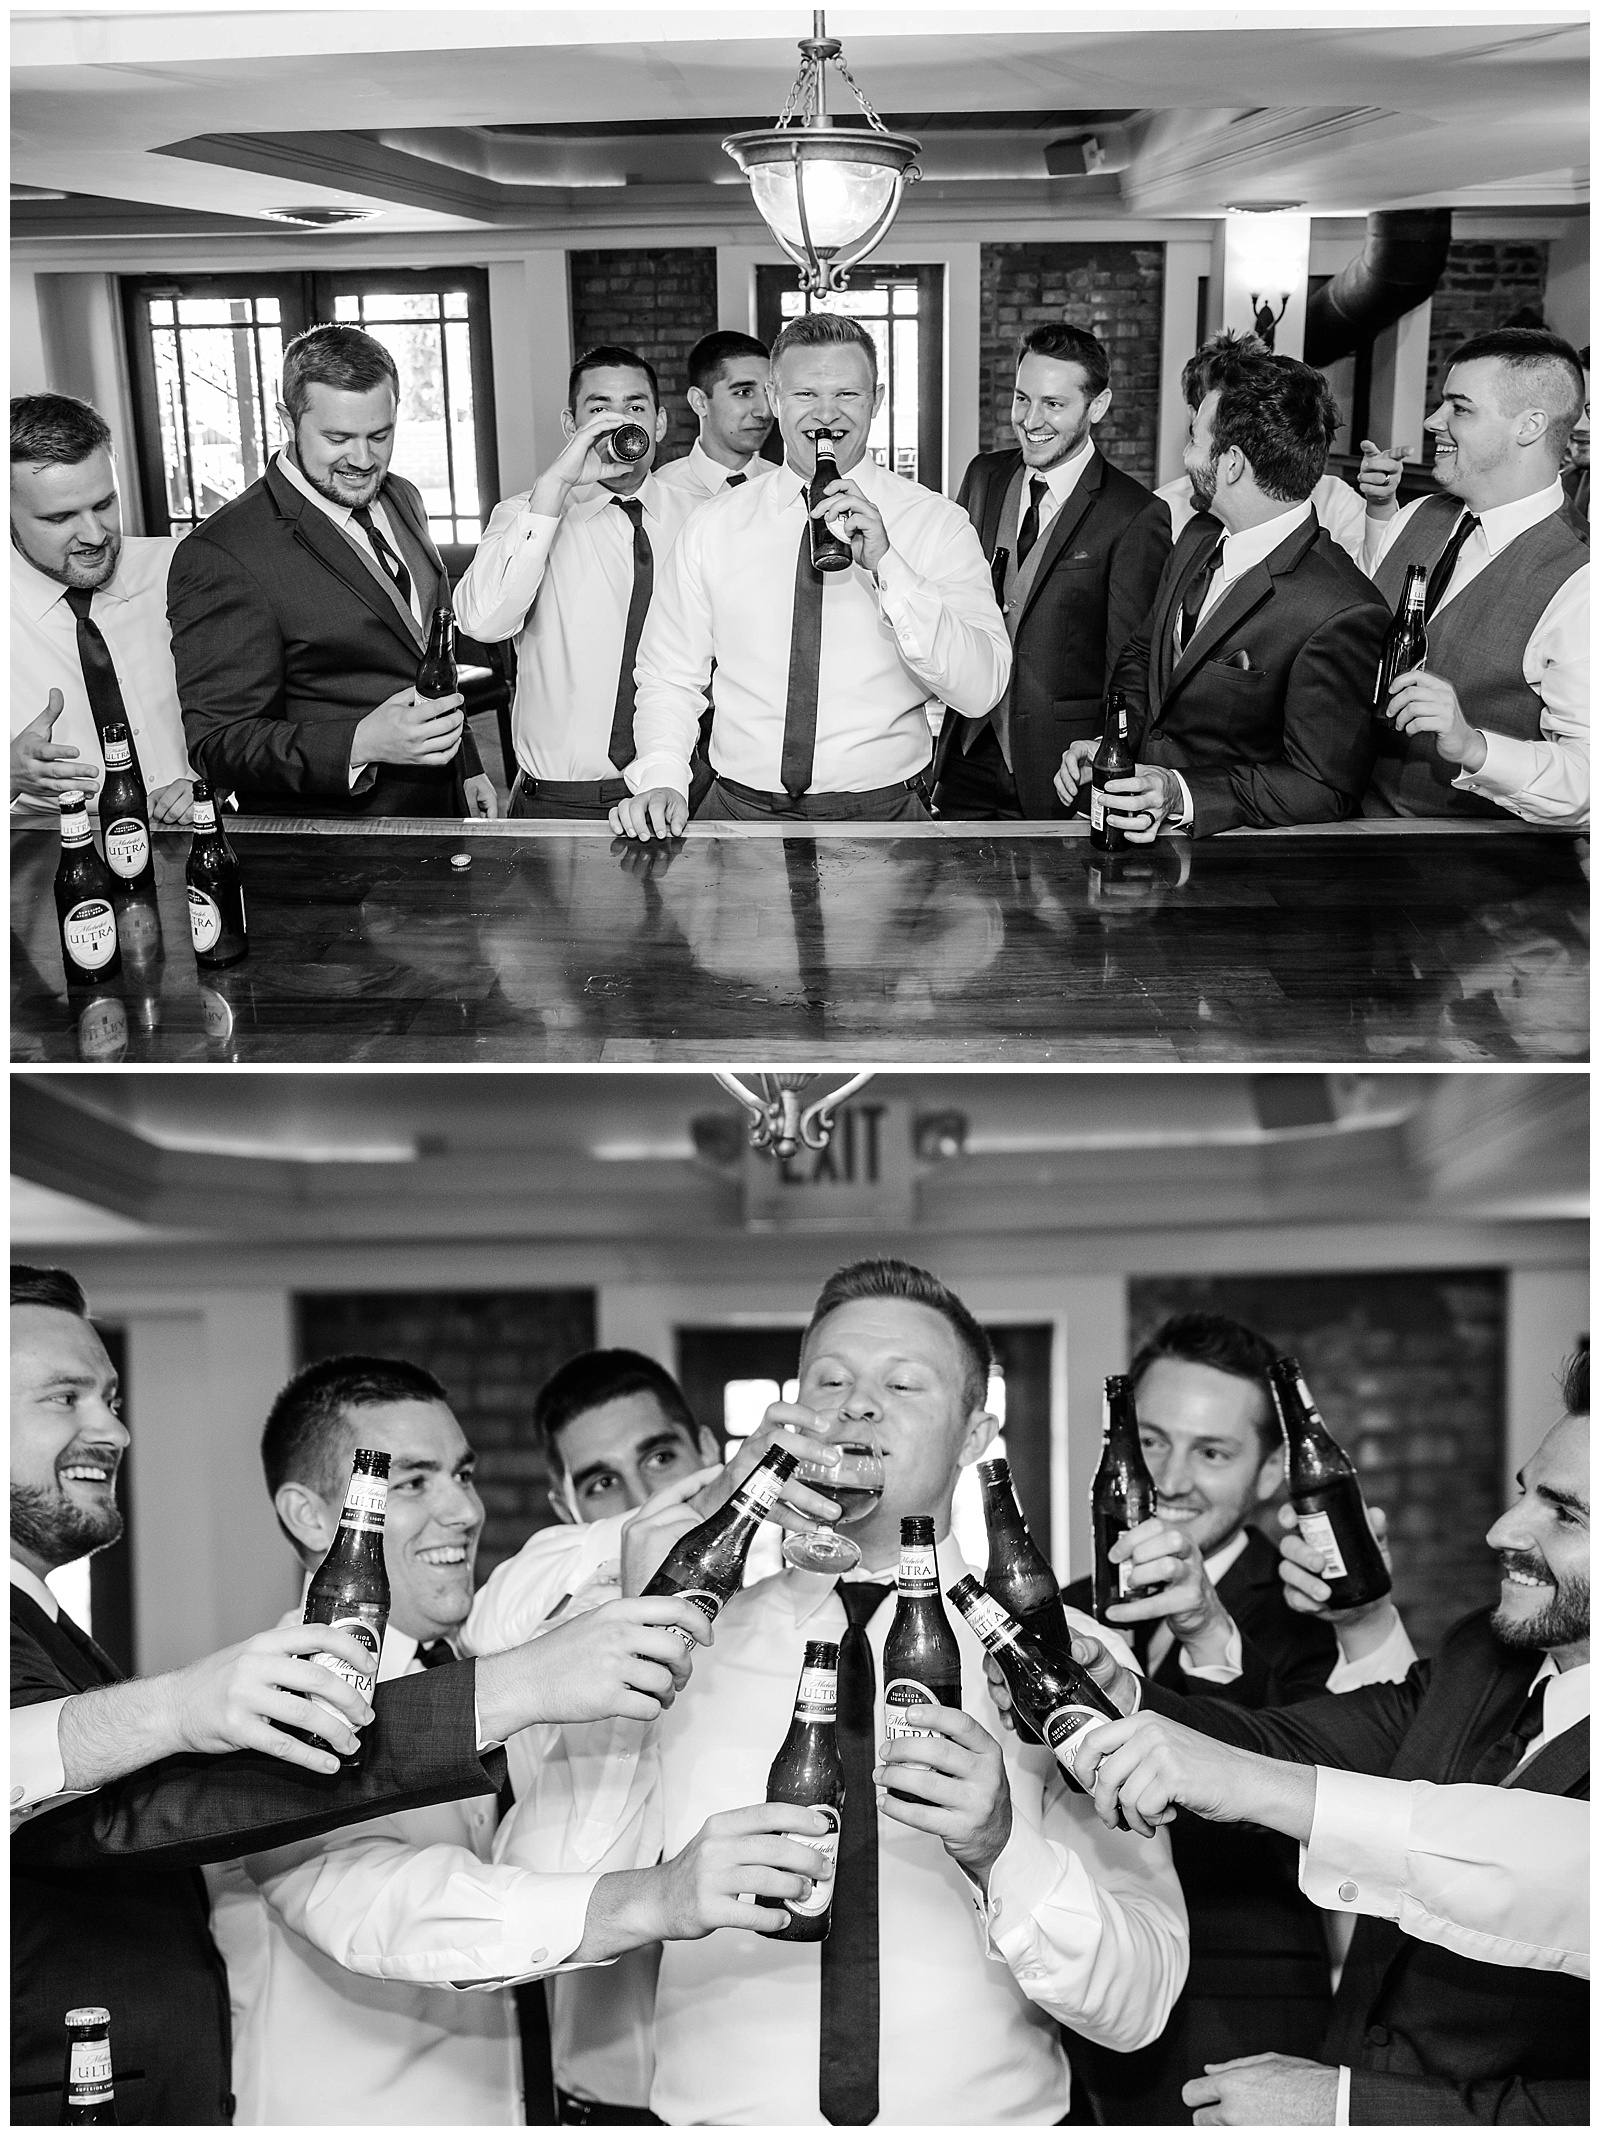 Bairdwedding_Acworth_TheConservatory-KaraBlakemanphotography_2017_20